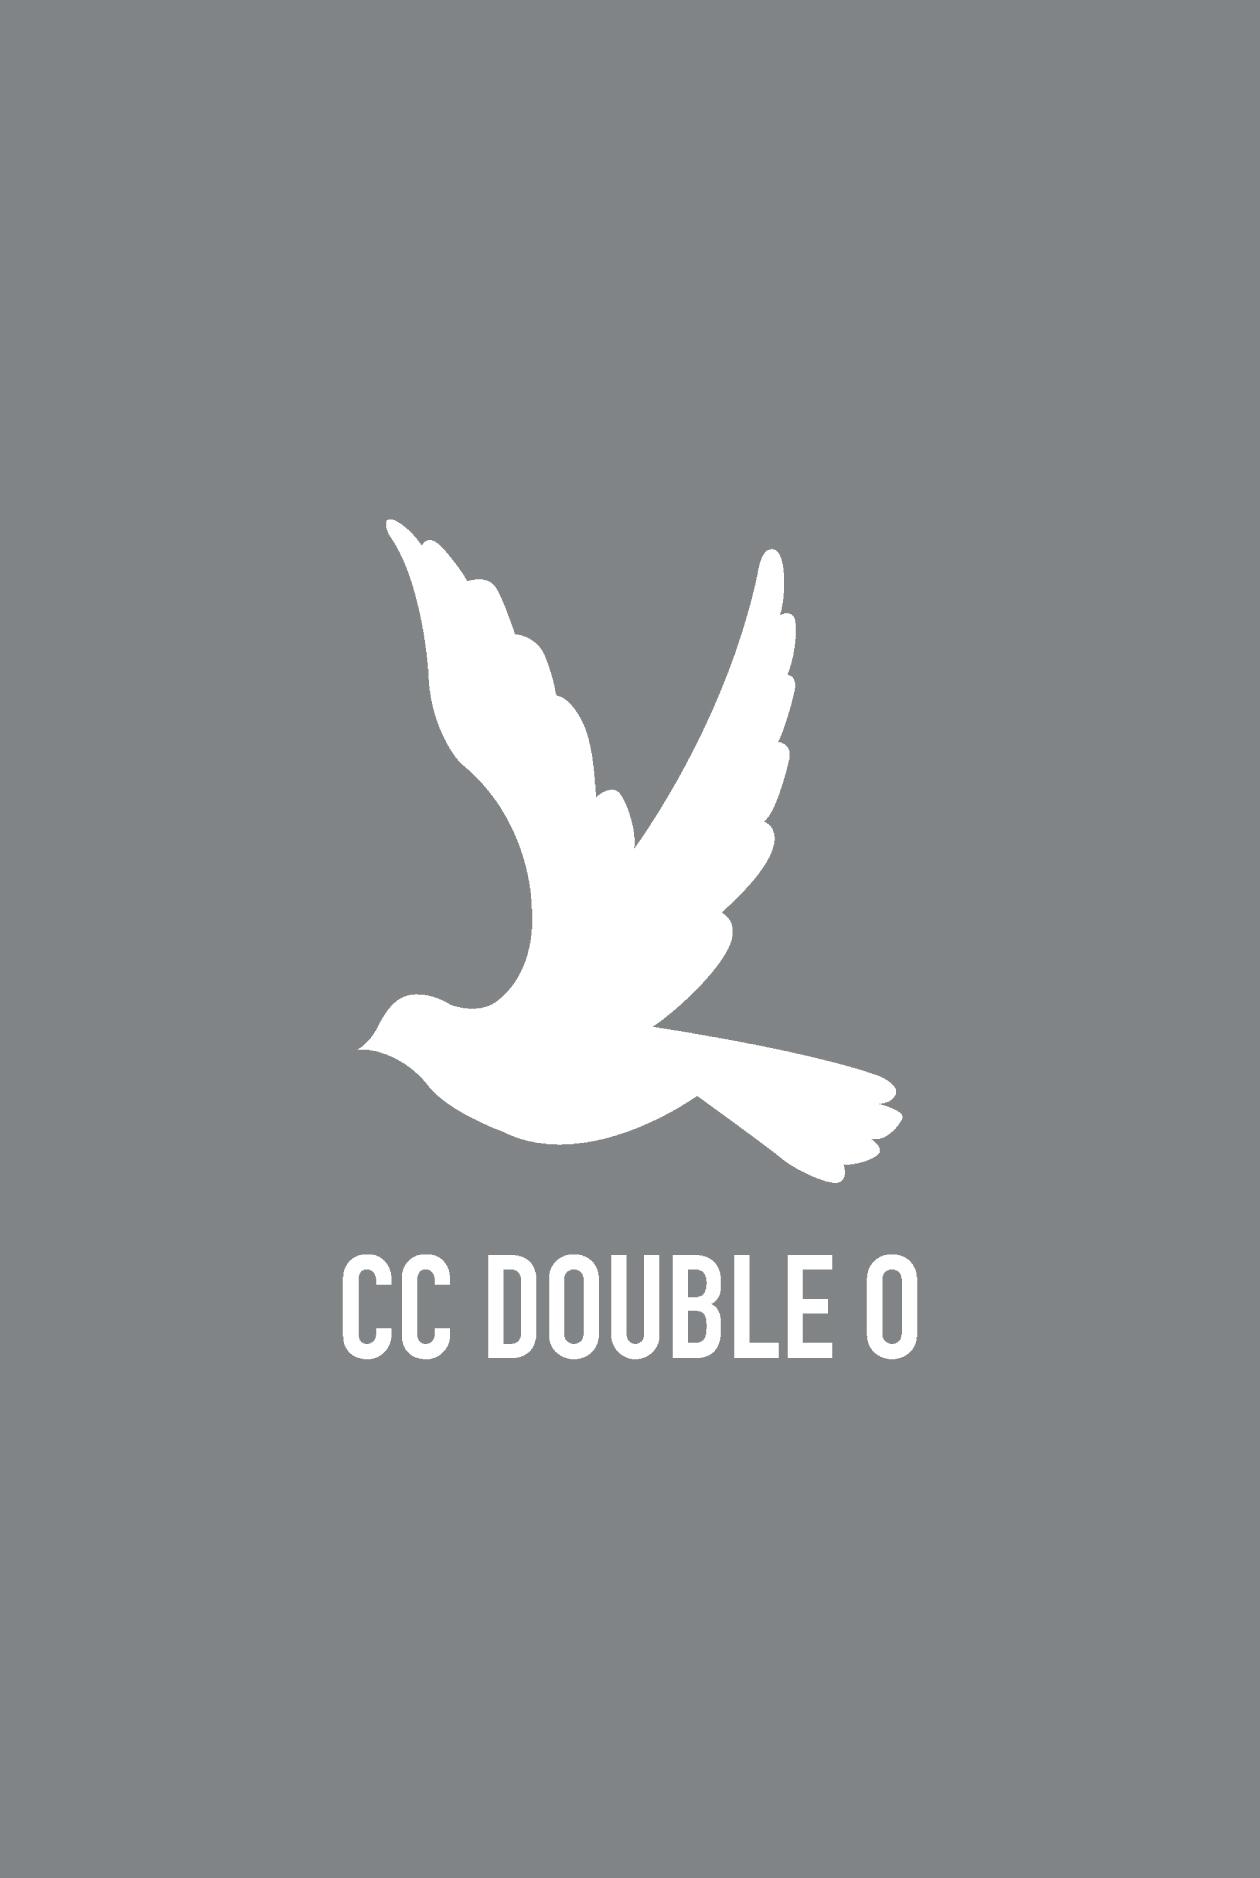 CC DOUBLE O Drawstring Graphic Pants